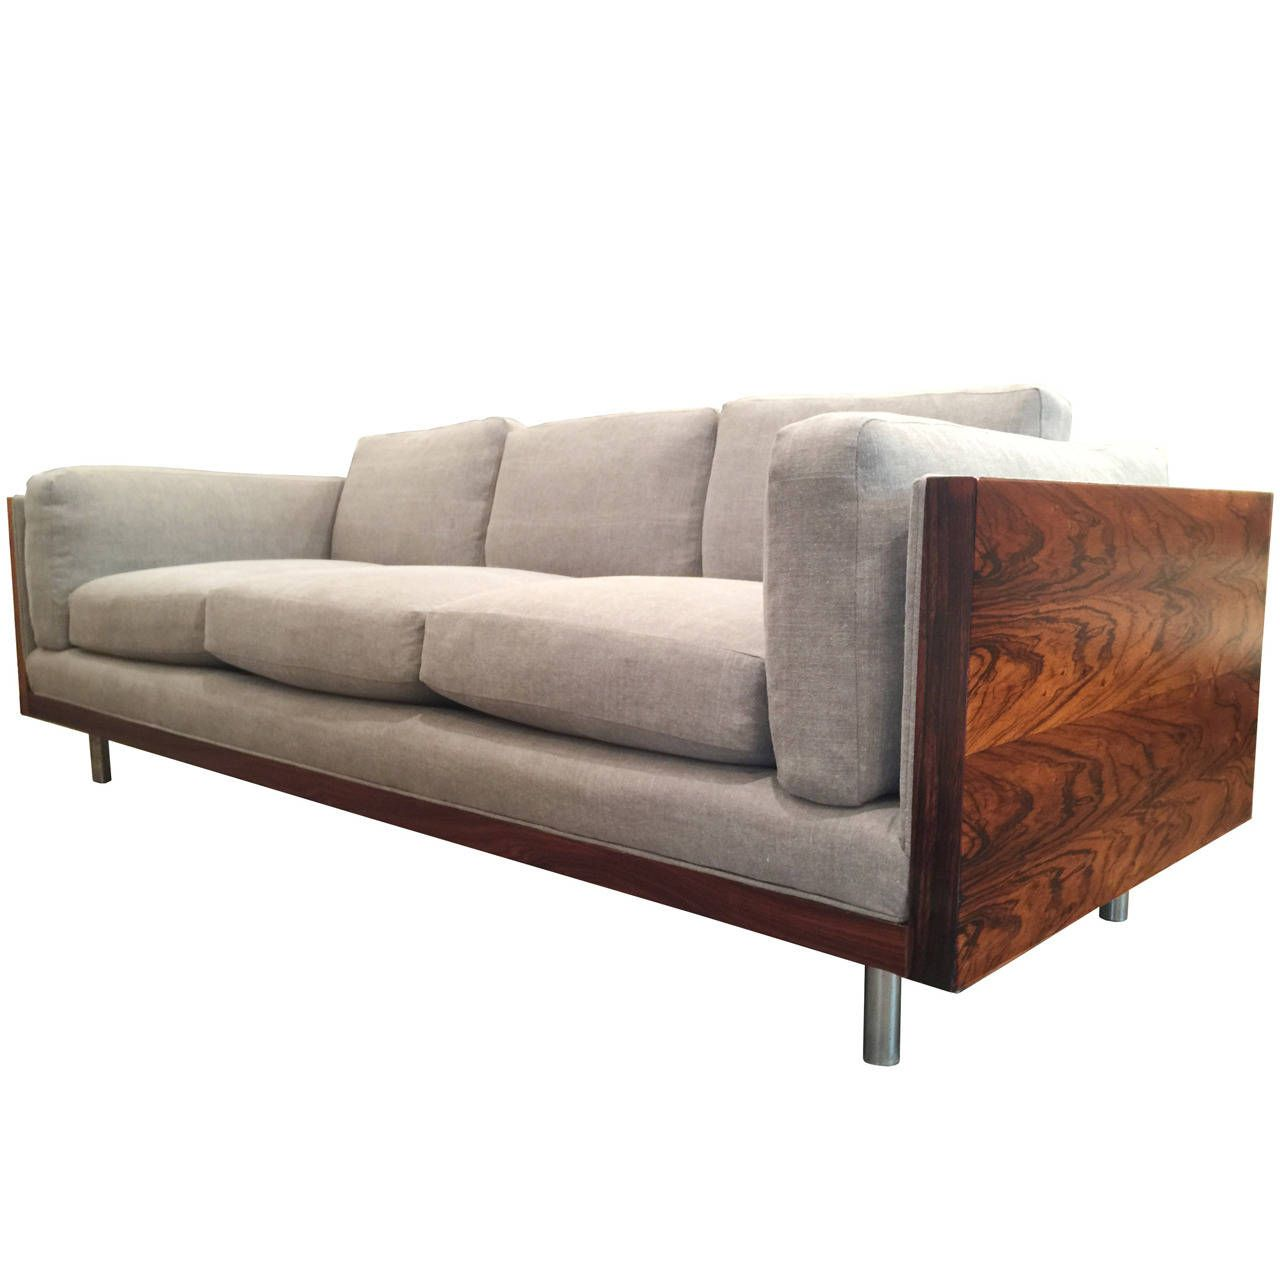 Rosewood Wrapped Milo Baughman Sofa 1stdibs Fan Faves Modern Sofa Modern Sofa Designs Sofa